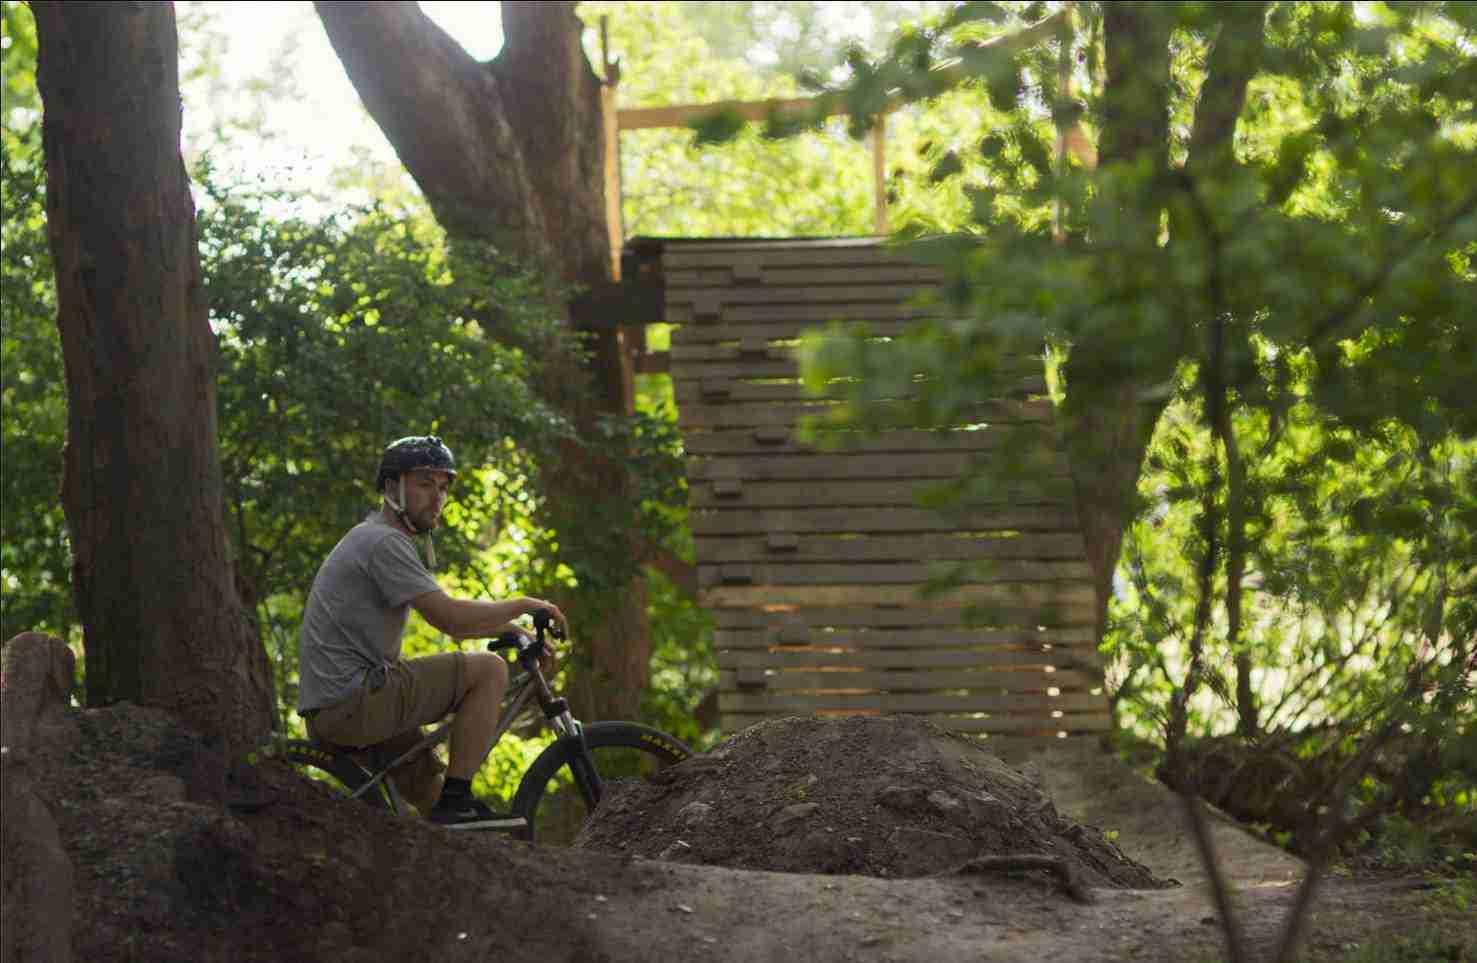 holmen-dirt-aktiviteter-dirtjump-bmx-pumptrack-rekreativ-social-friluftsliv-cykelleg-sikker-cyklist-København-Copenhagen-Christianshavn-cykel-dirt-jump-2